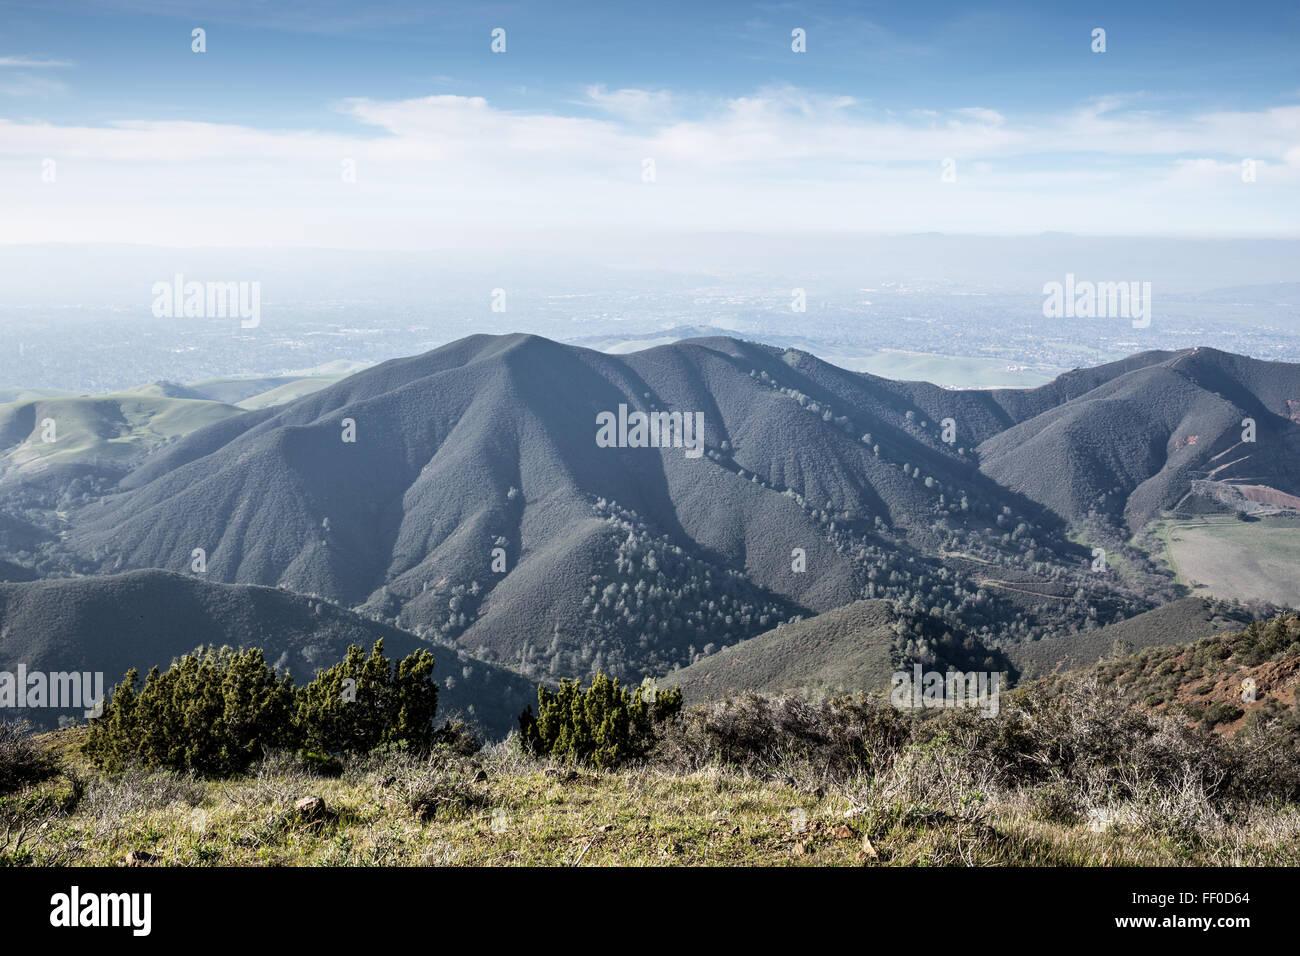 Views from Eagle Peak, Mt. Diablo State Park, Northern California Landscape. - Stock Image